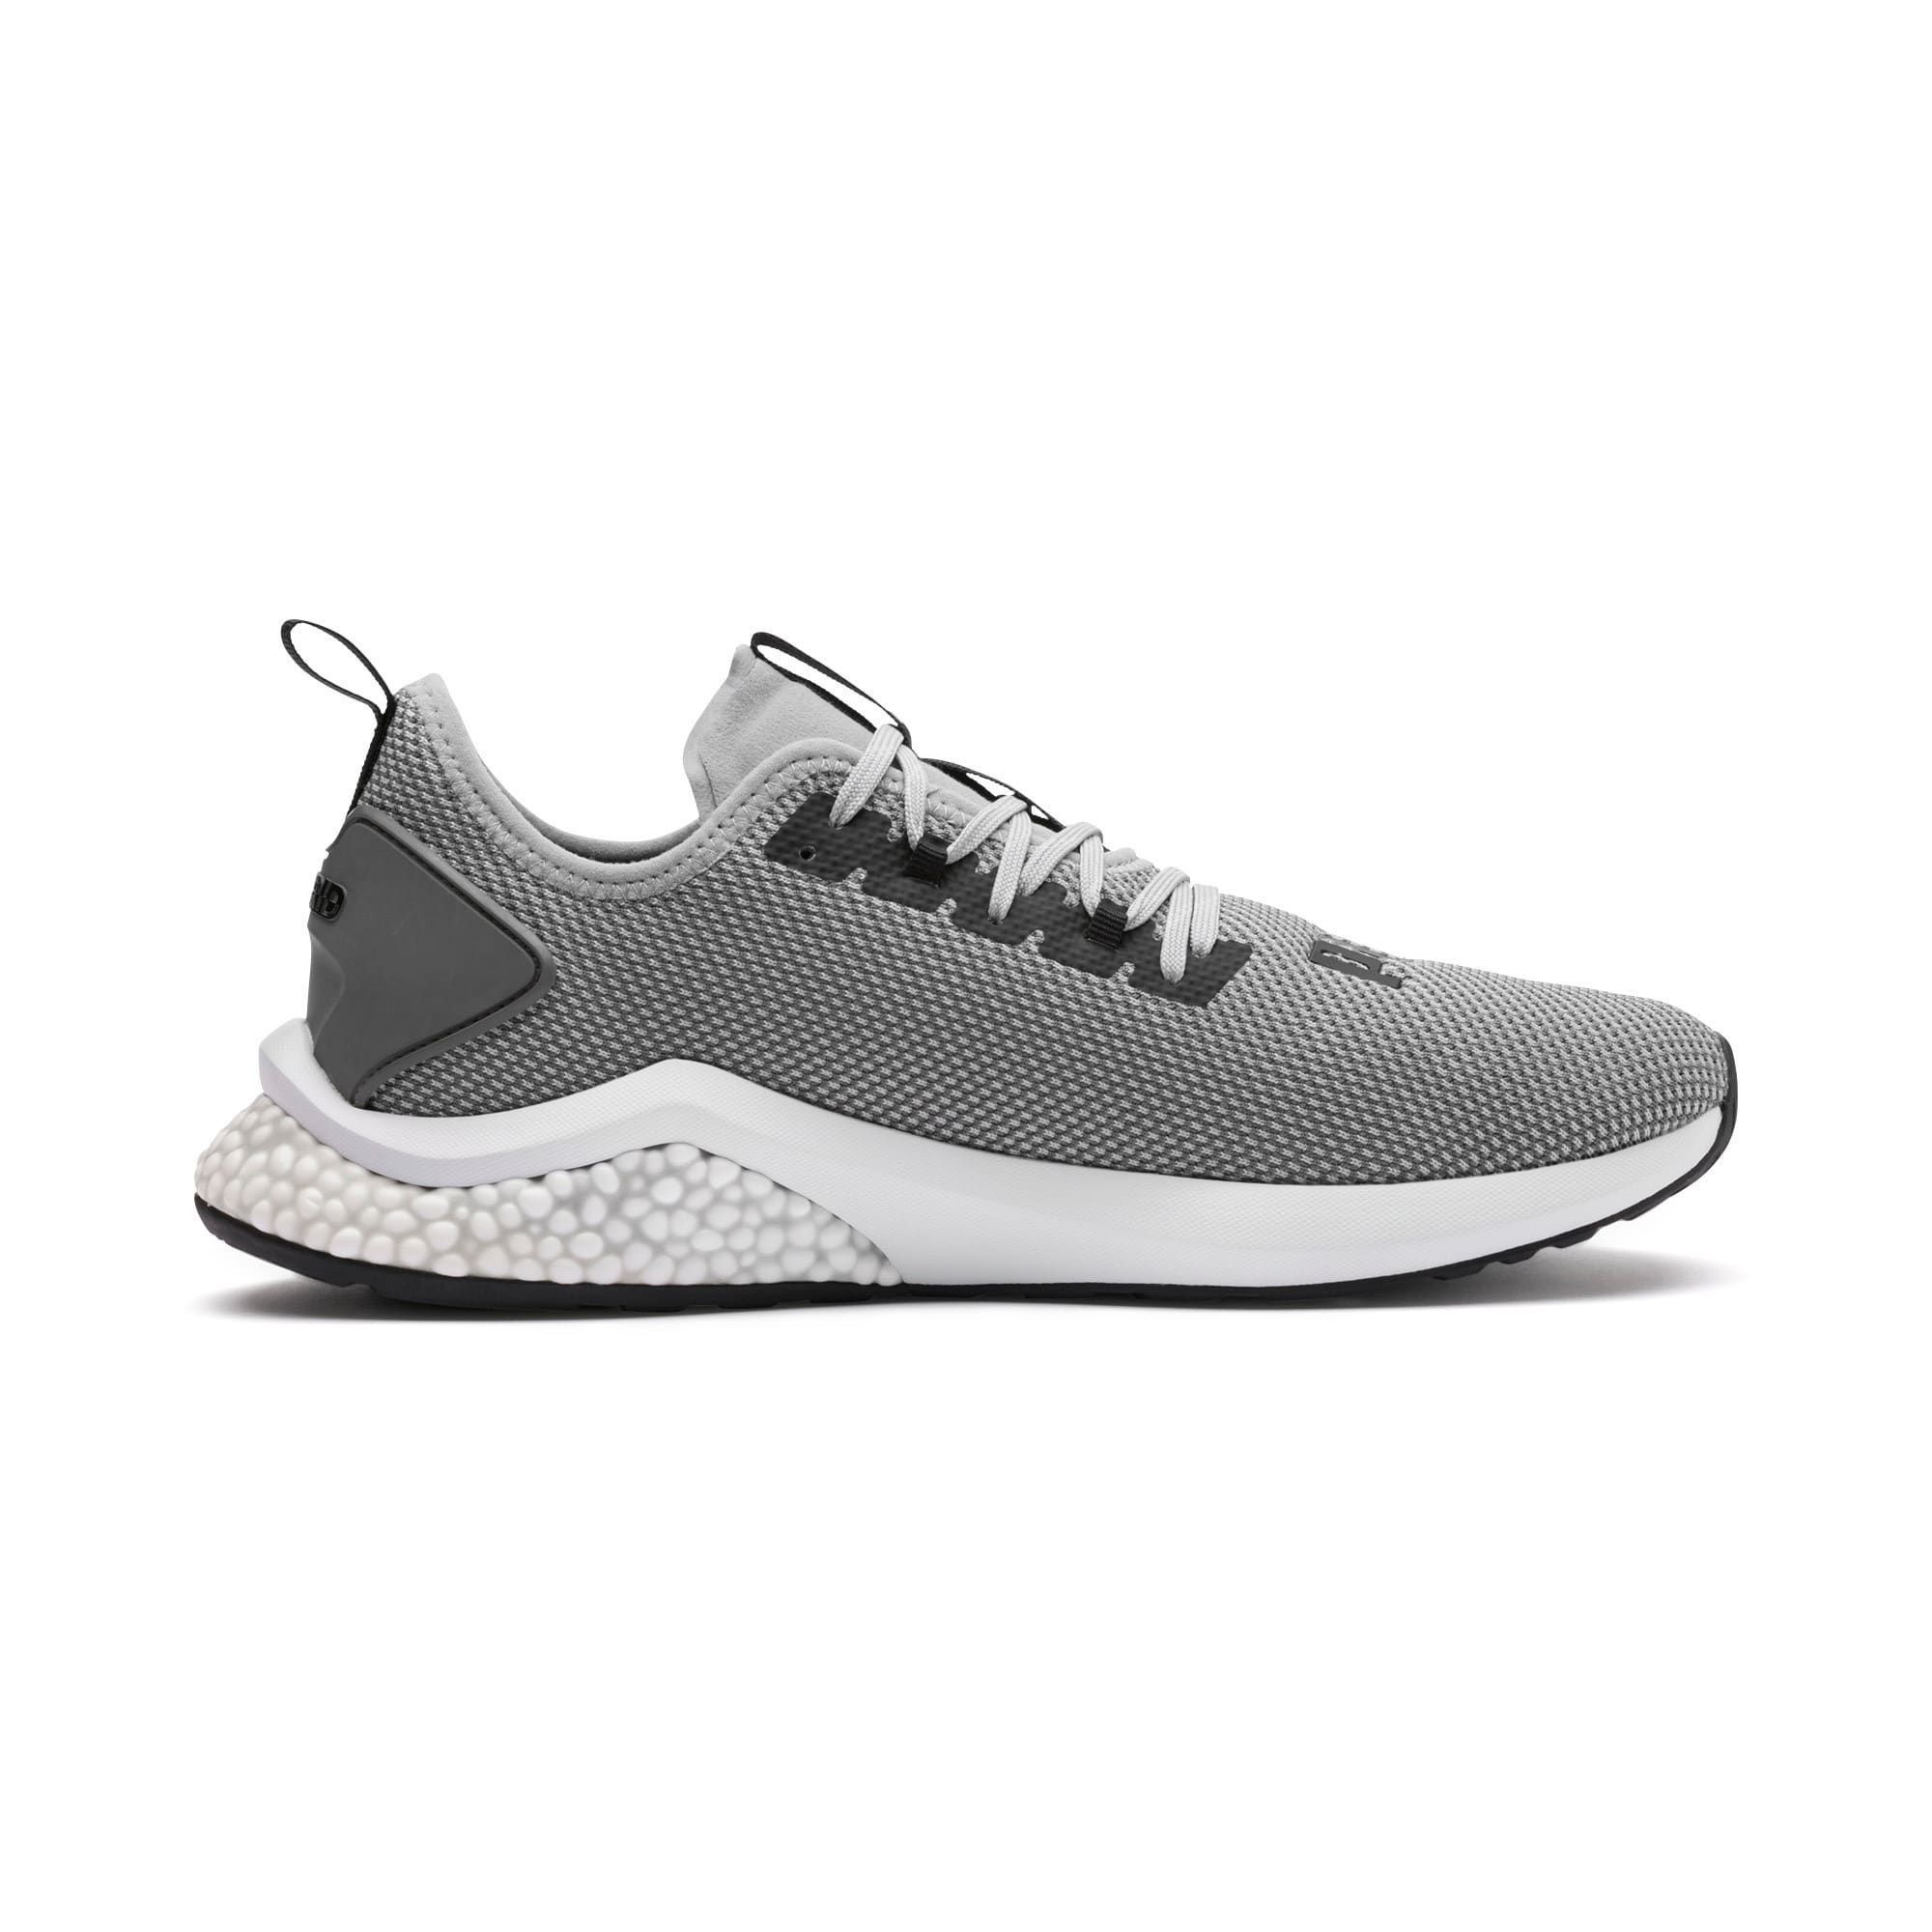 PUMA Hybrid Nx Men's Running Shoes in